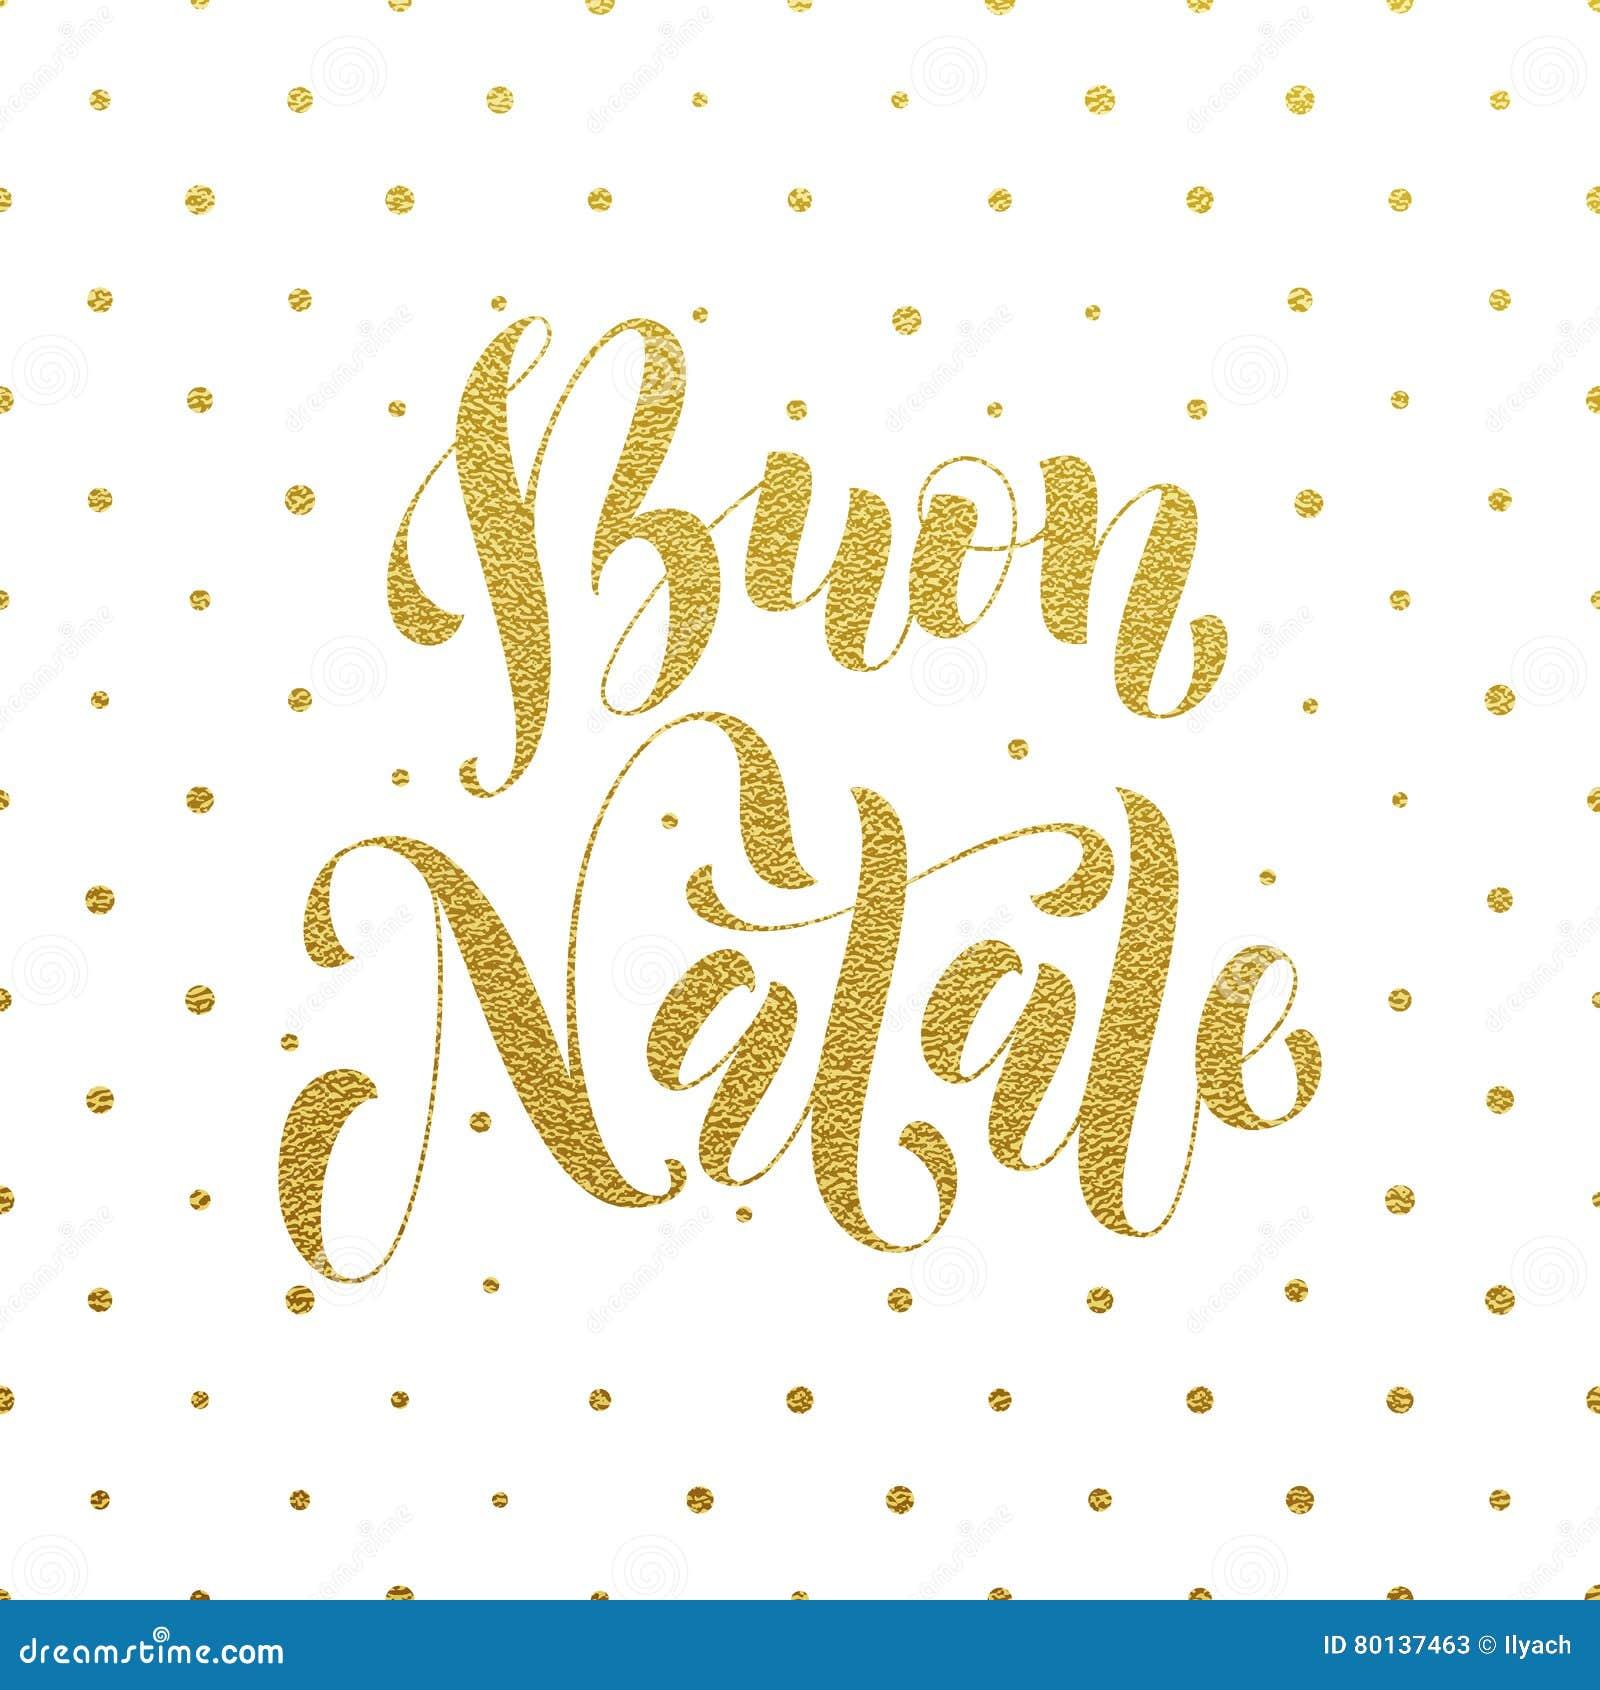 Buon Natale Glitter.Buon Natale Greeting Italian Merry Christmas Stock Illustration